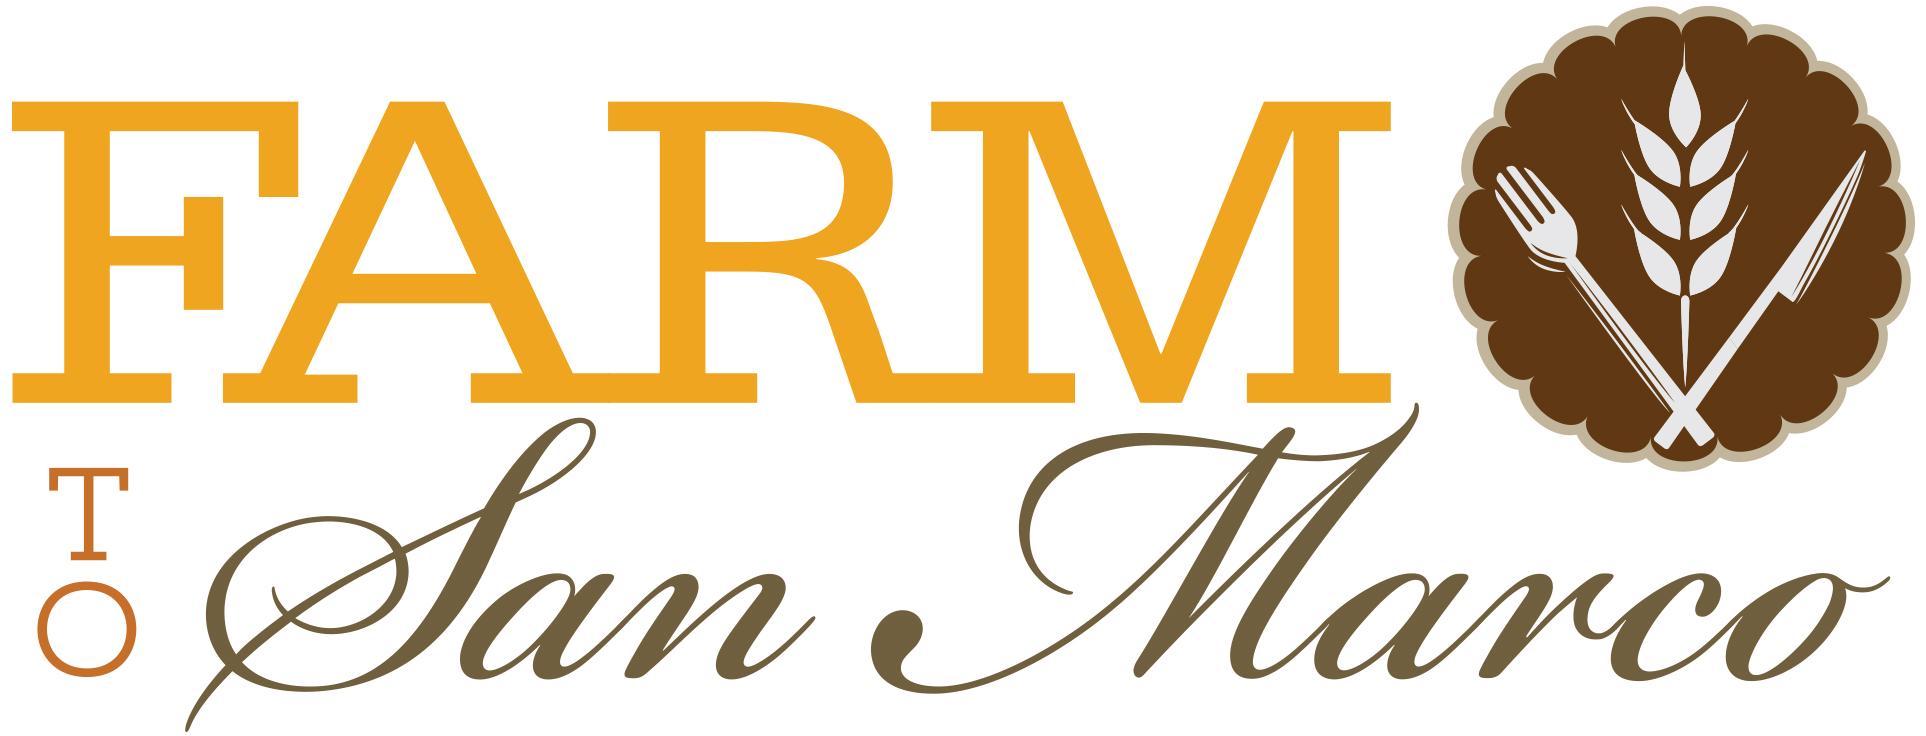 FRMtoSanMar Logo Color